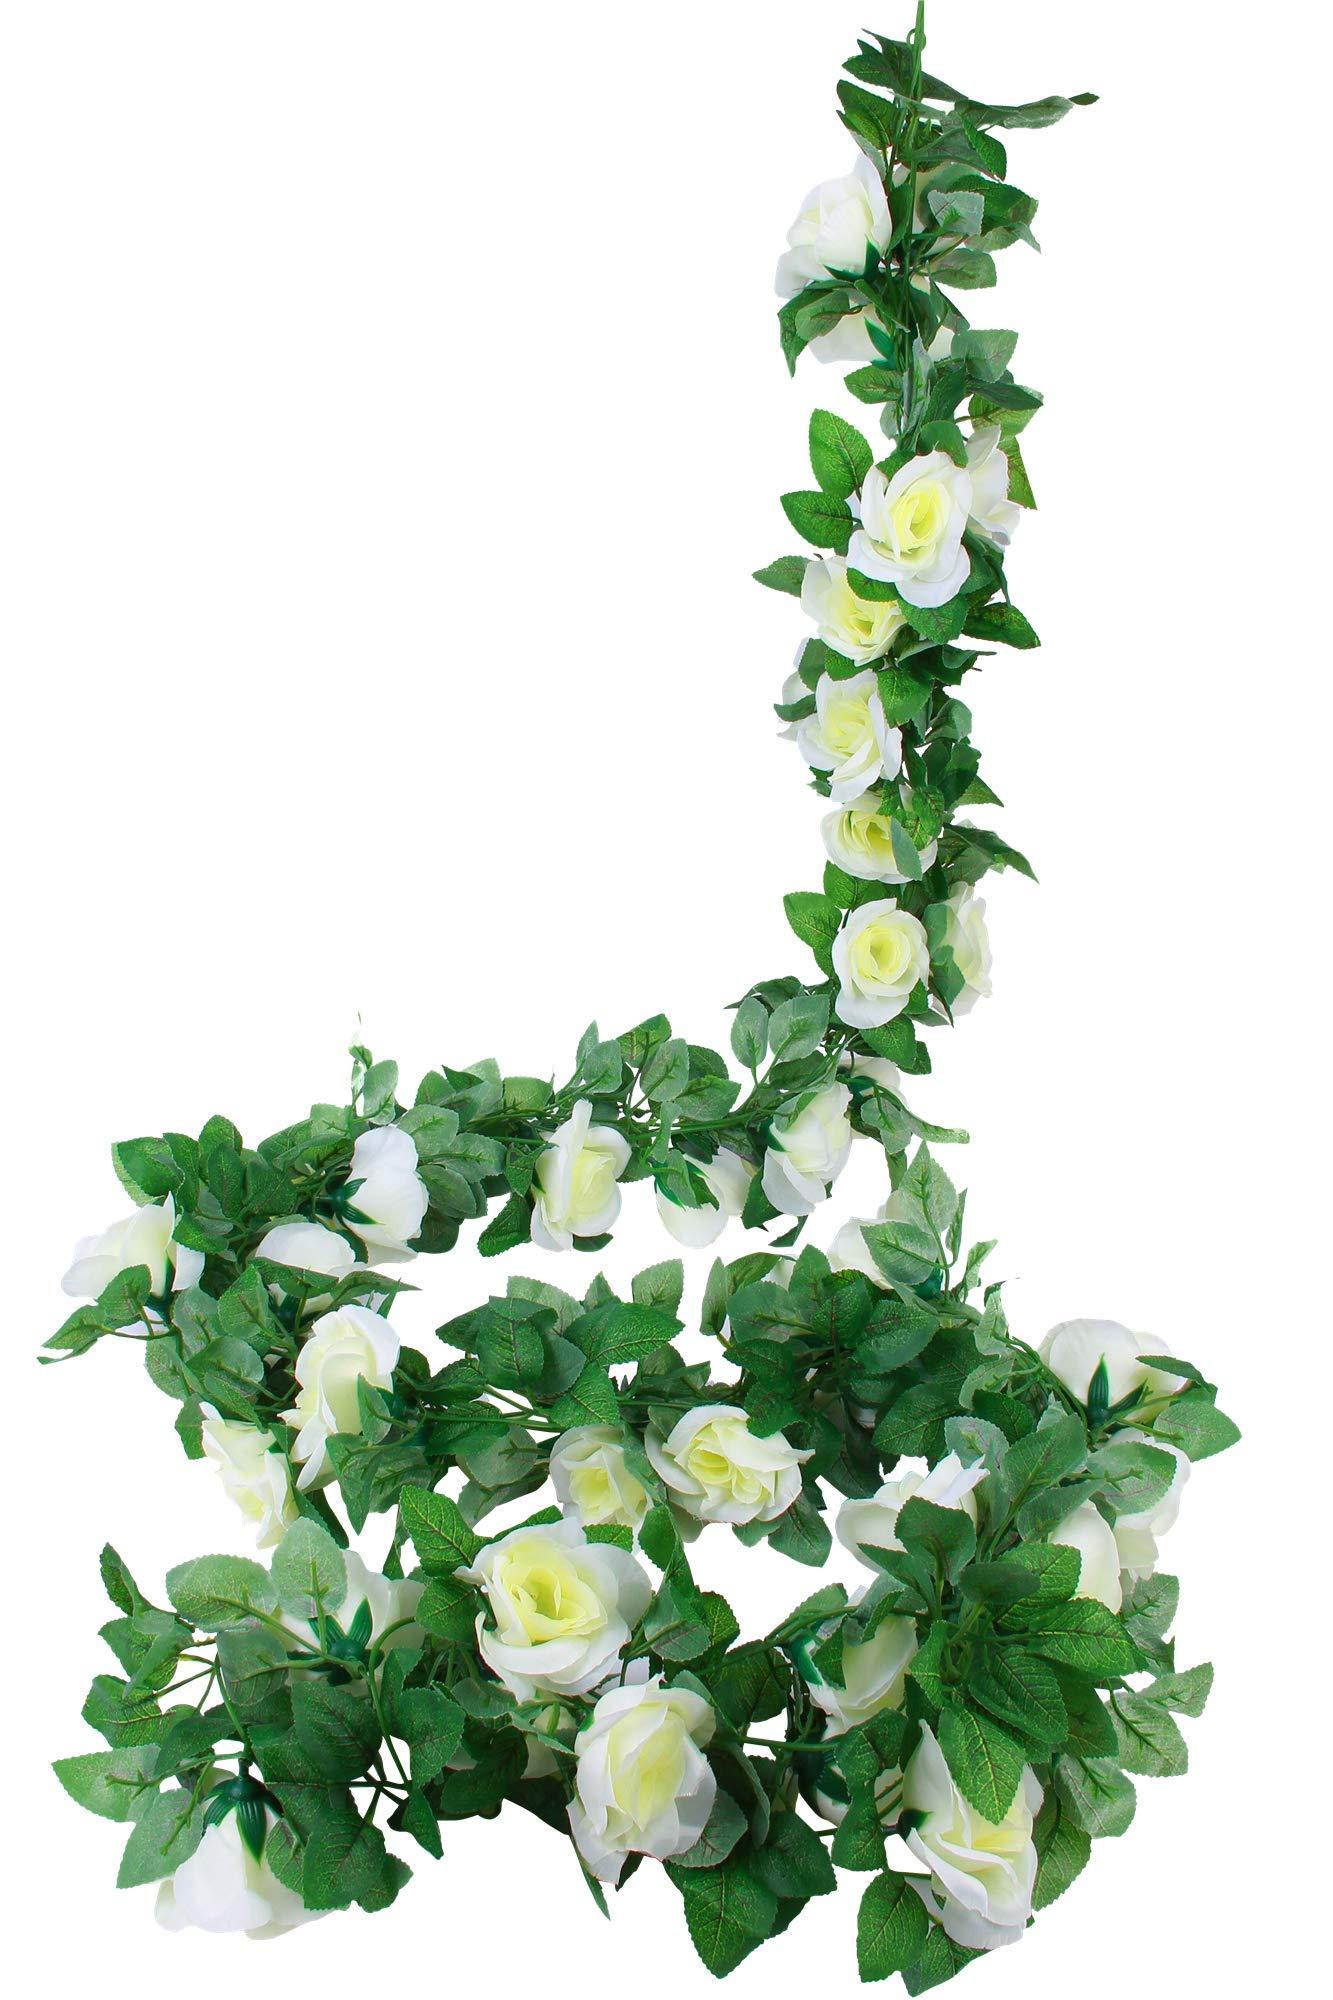 MARTHA&IVAN 3 Strands Artificial Rose Garland Fake Rose Vine Faux Hanging Flower Garland for Wedding Arch Backdrops Home Decor (White, 3)